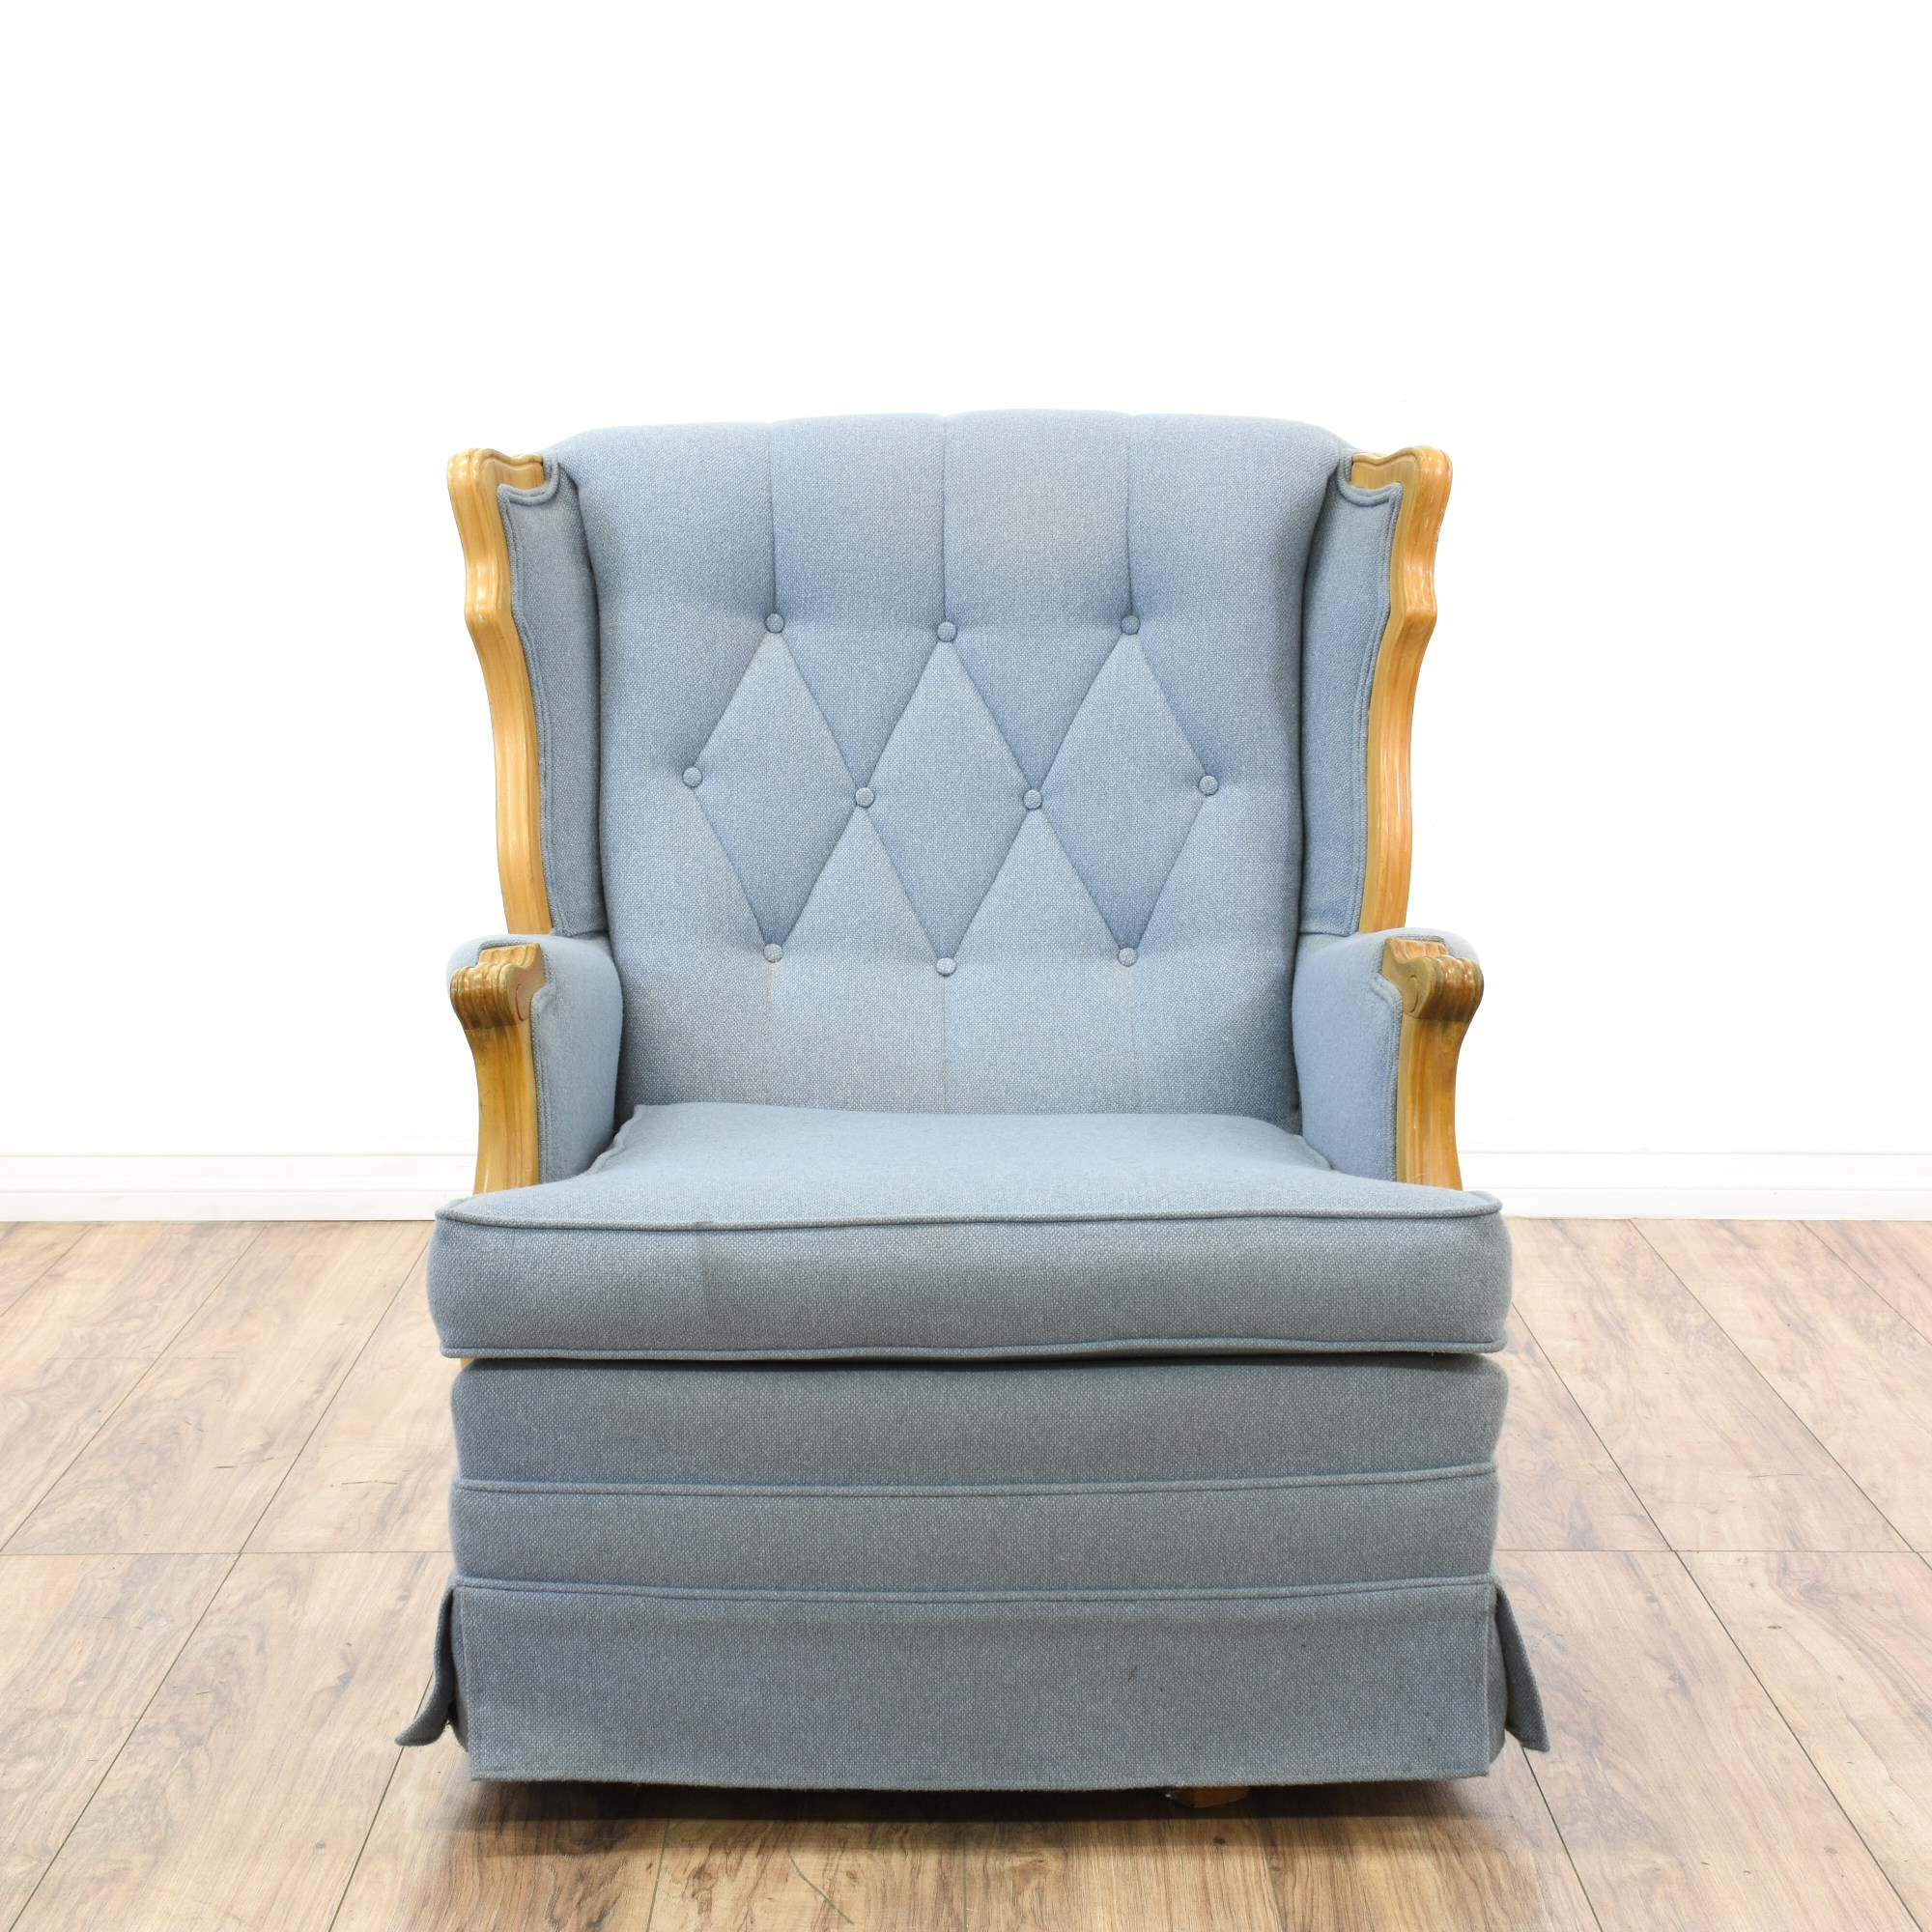 Blue Diamond Tufted Rocking Chair  Loveseat Vintage